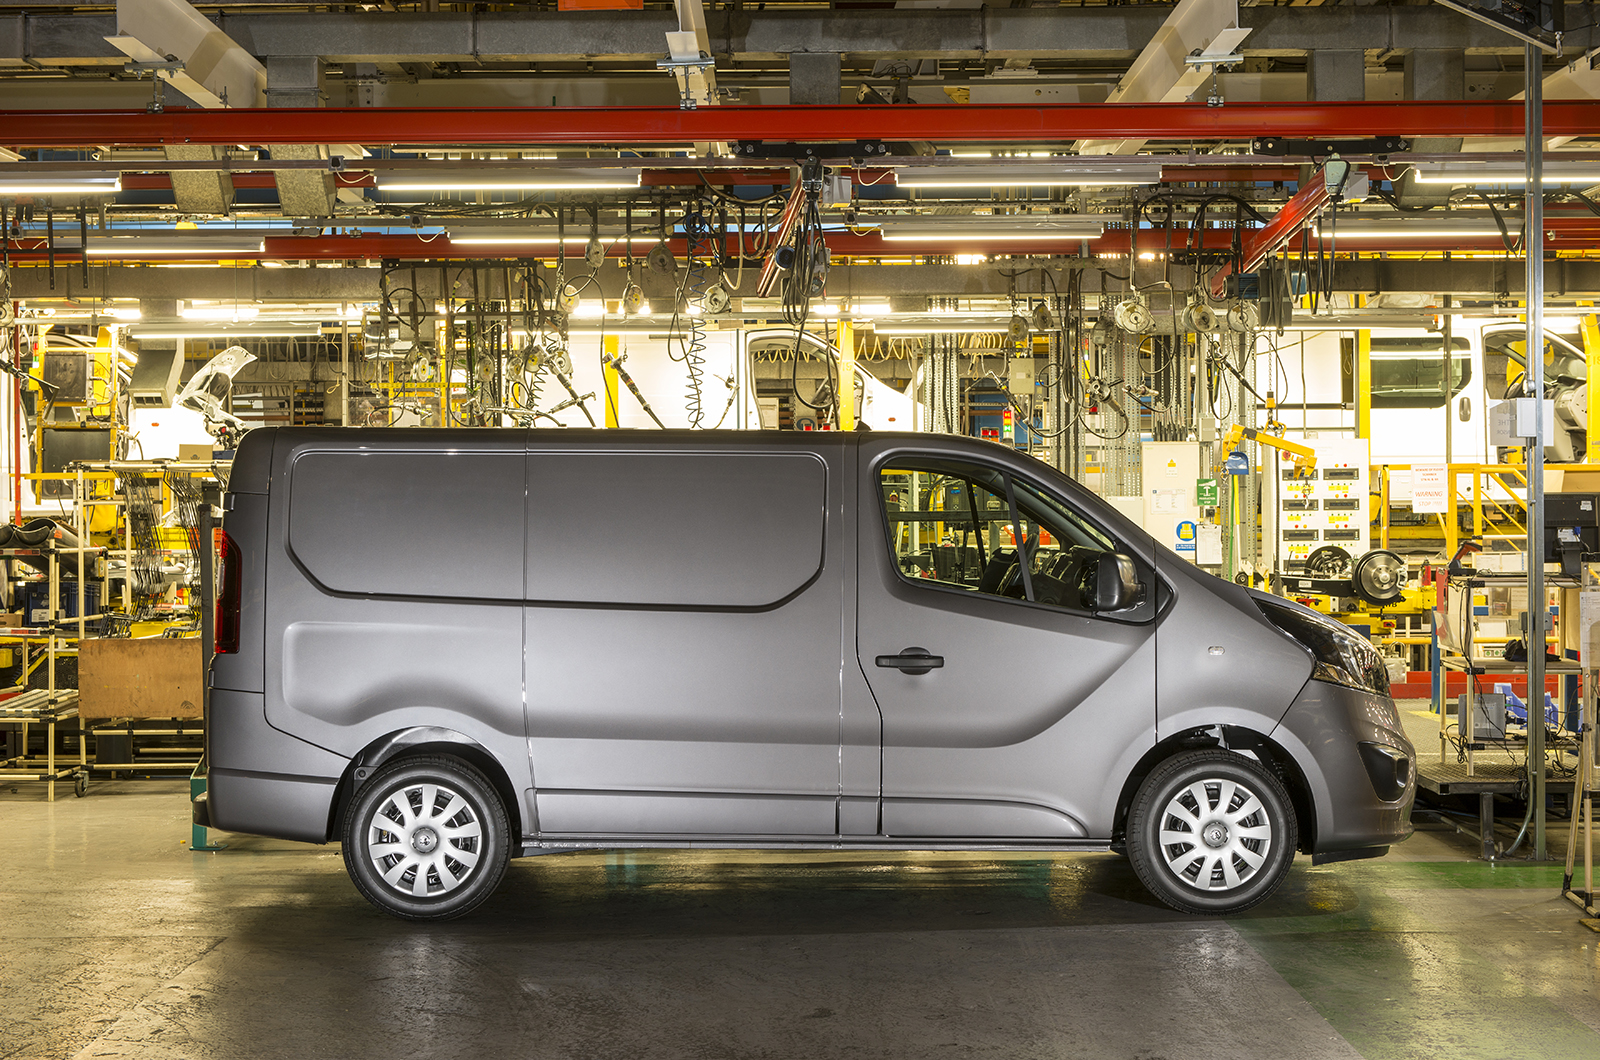 2014 [Renault/Opel/Fiat/Nissan] Trafic/Vivaro/Talento/NV300 - Page 4 Vauxhall-van-44